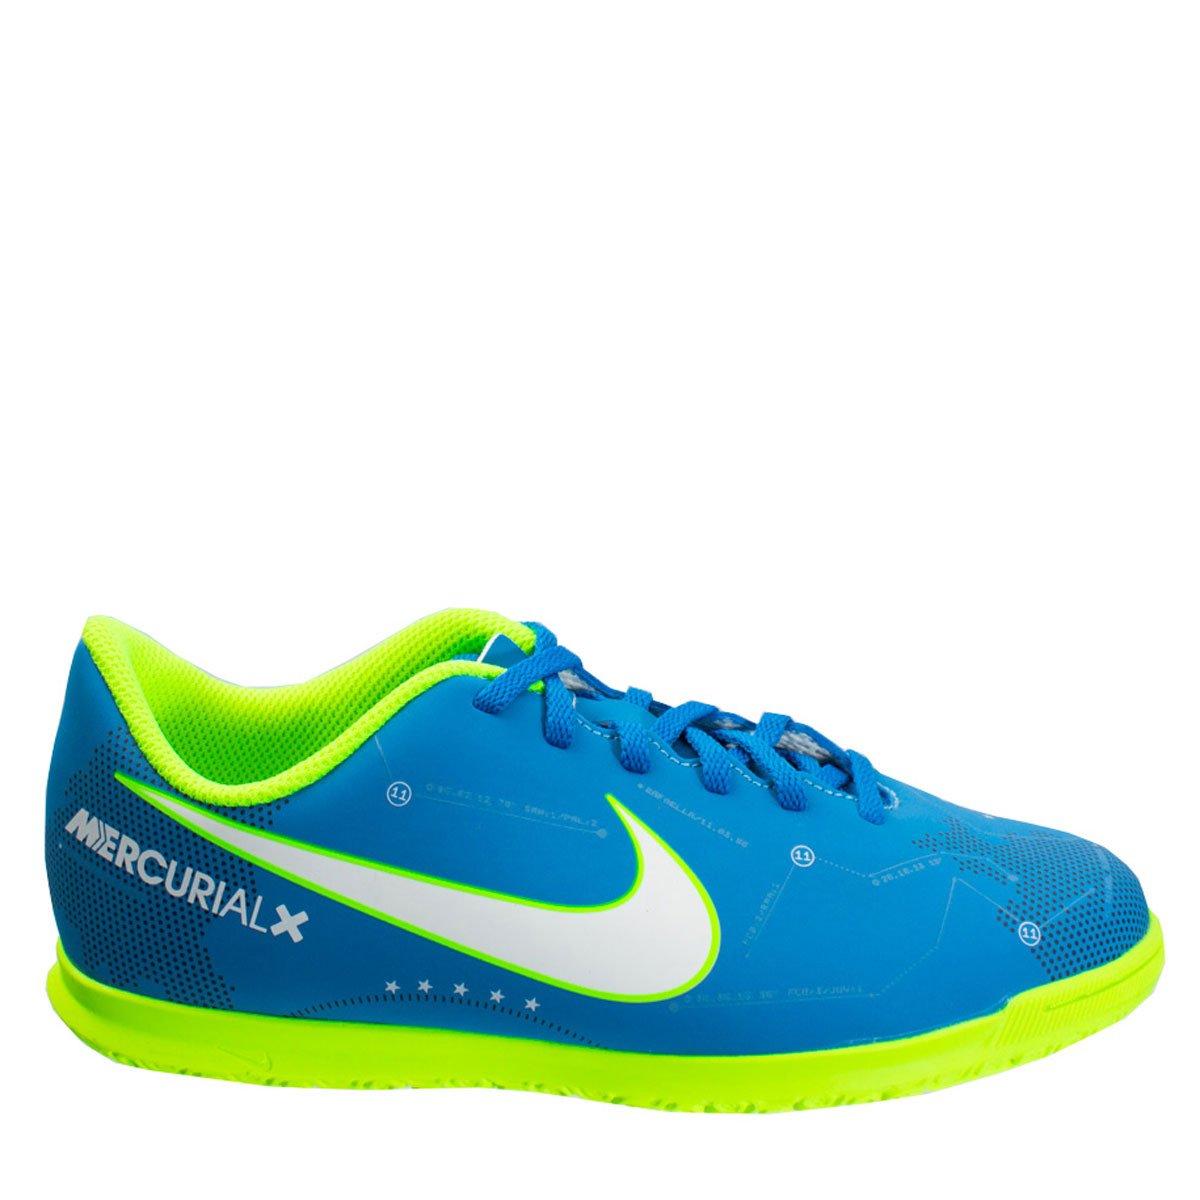 9e15c631ac4b1 Bizz Store - Chuteira Infantil Futsal Nike MercurialX VRTX III